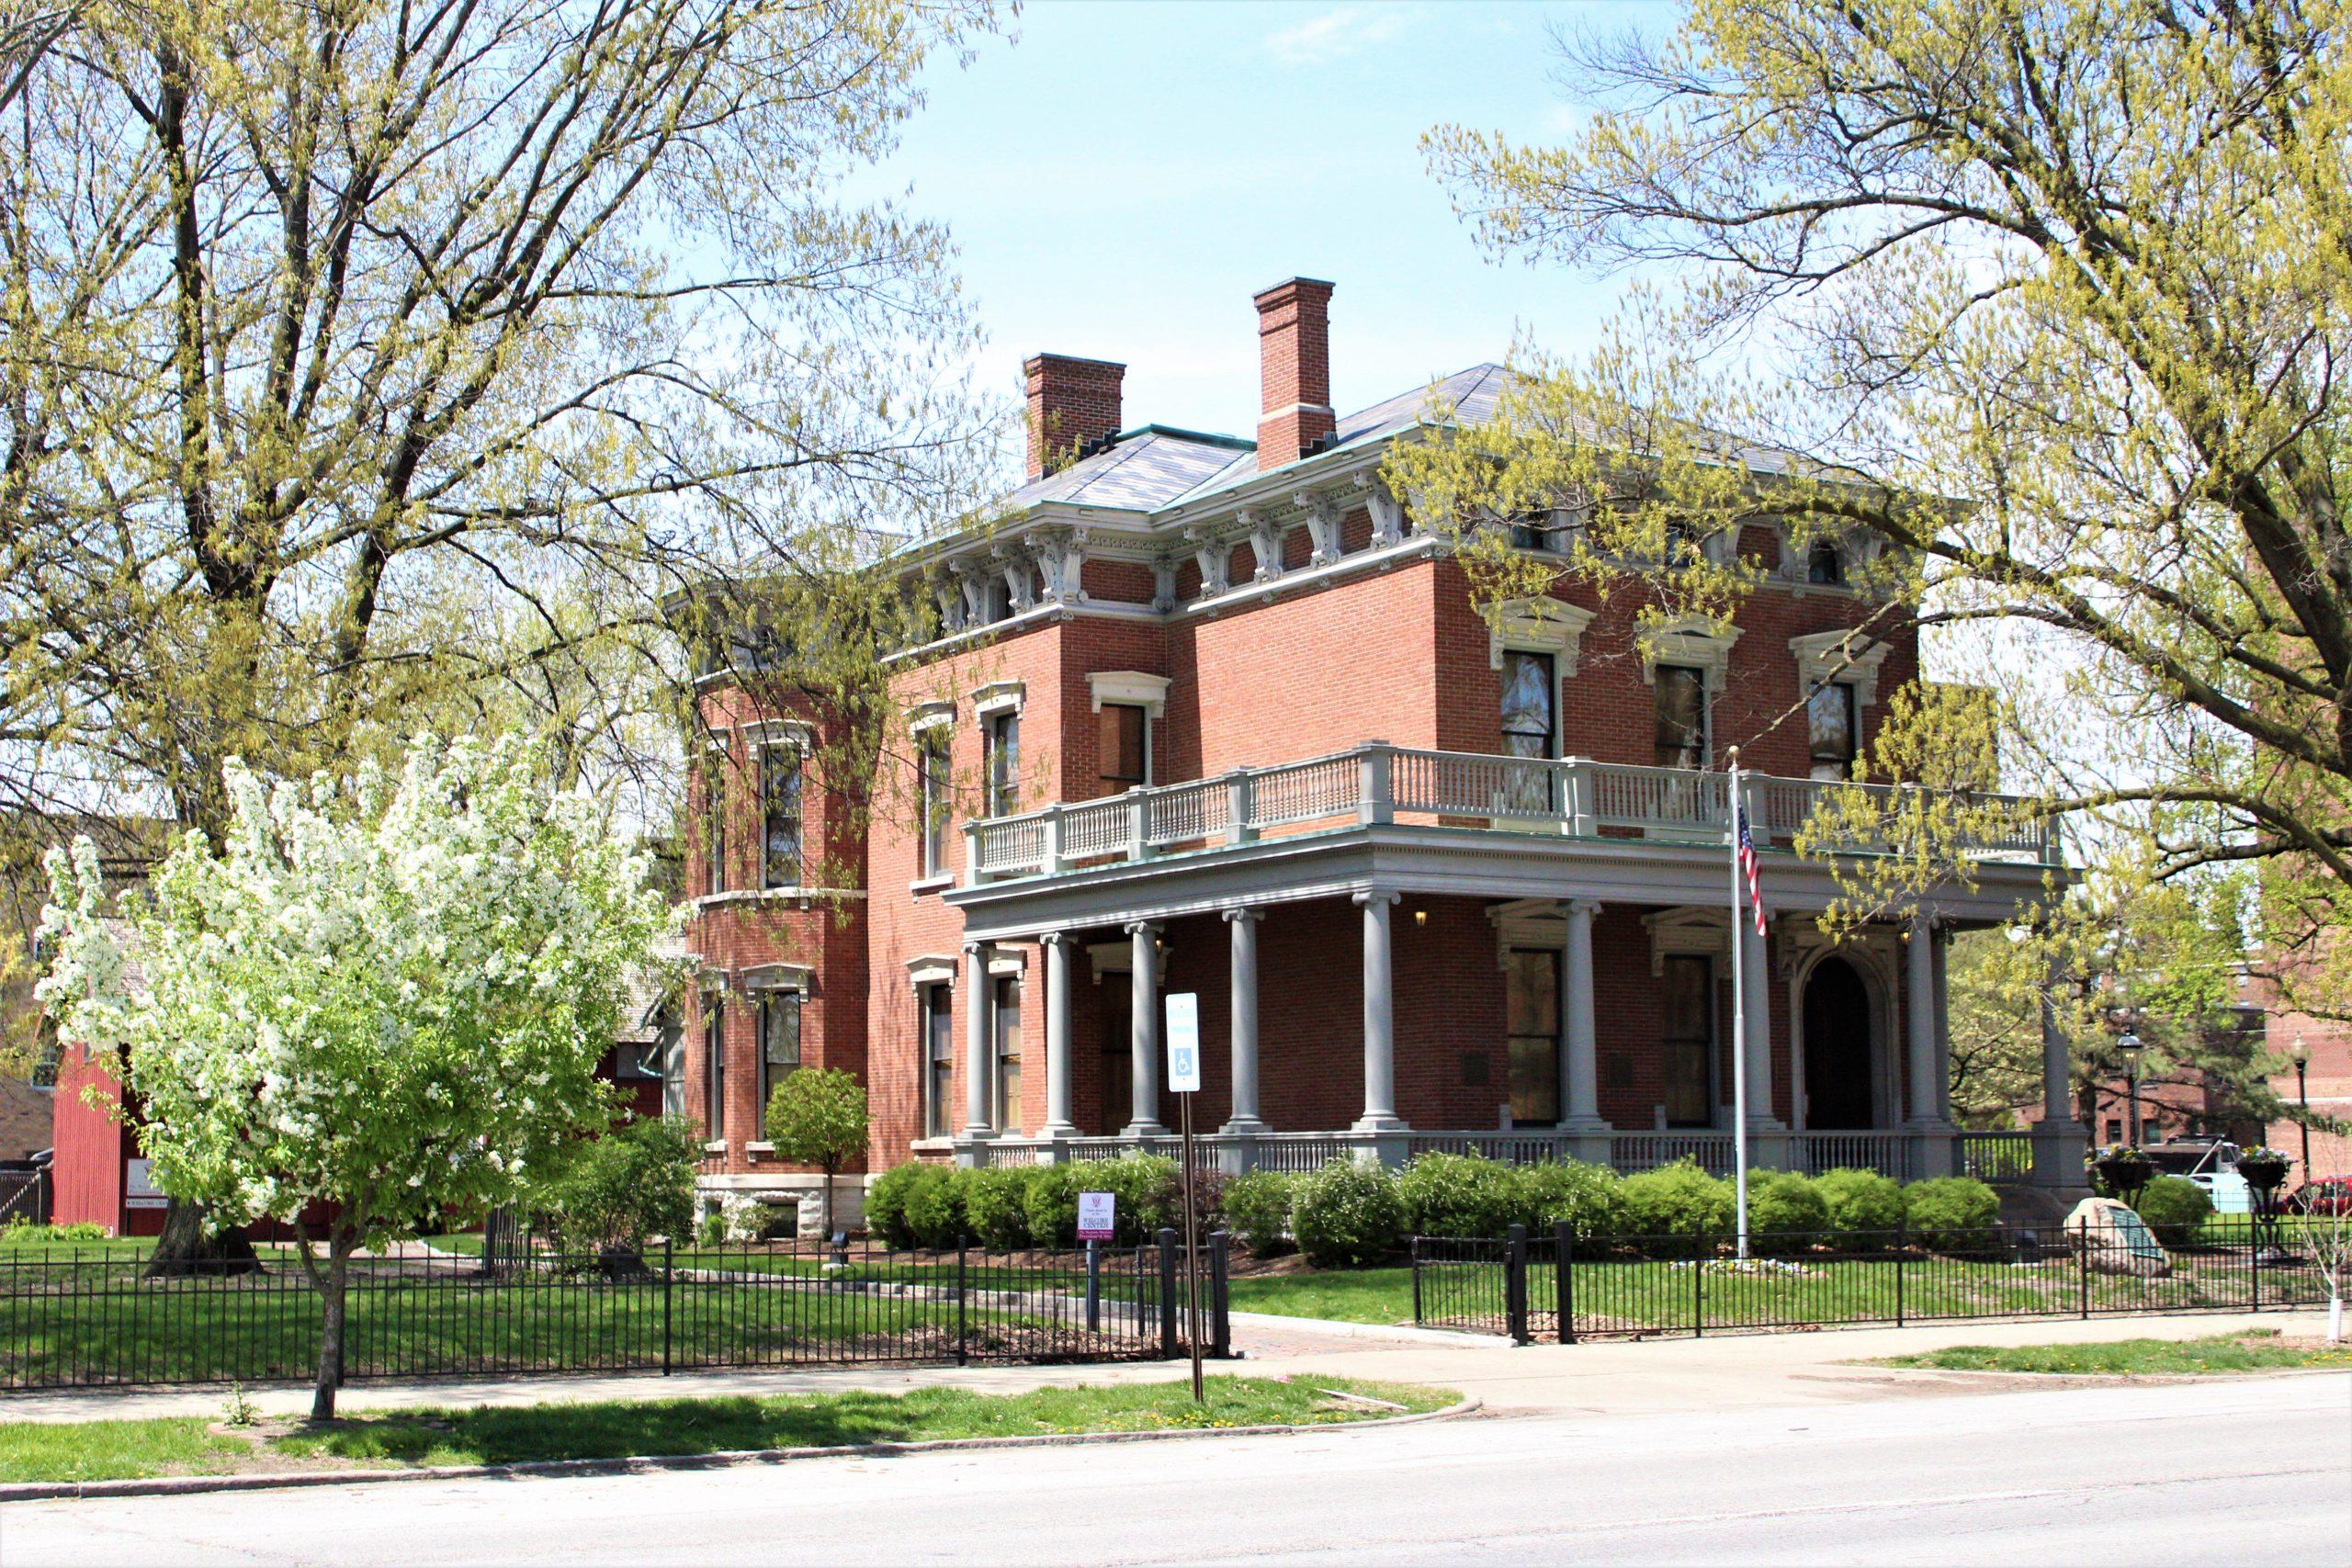 Old Northside - President Benjamin Harrison House